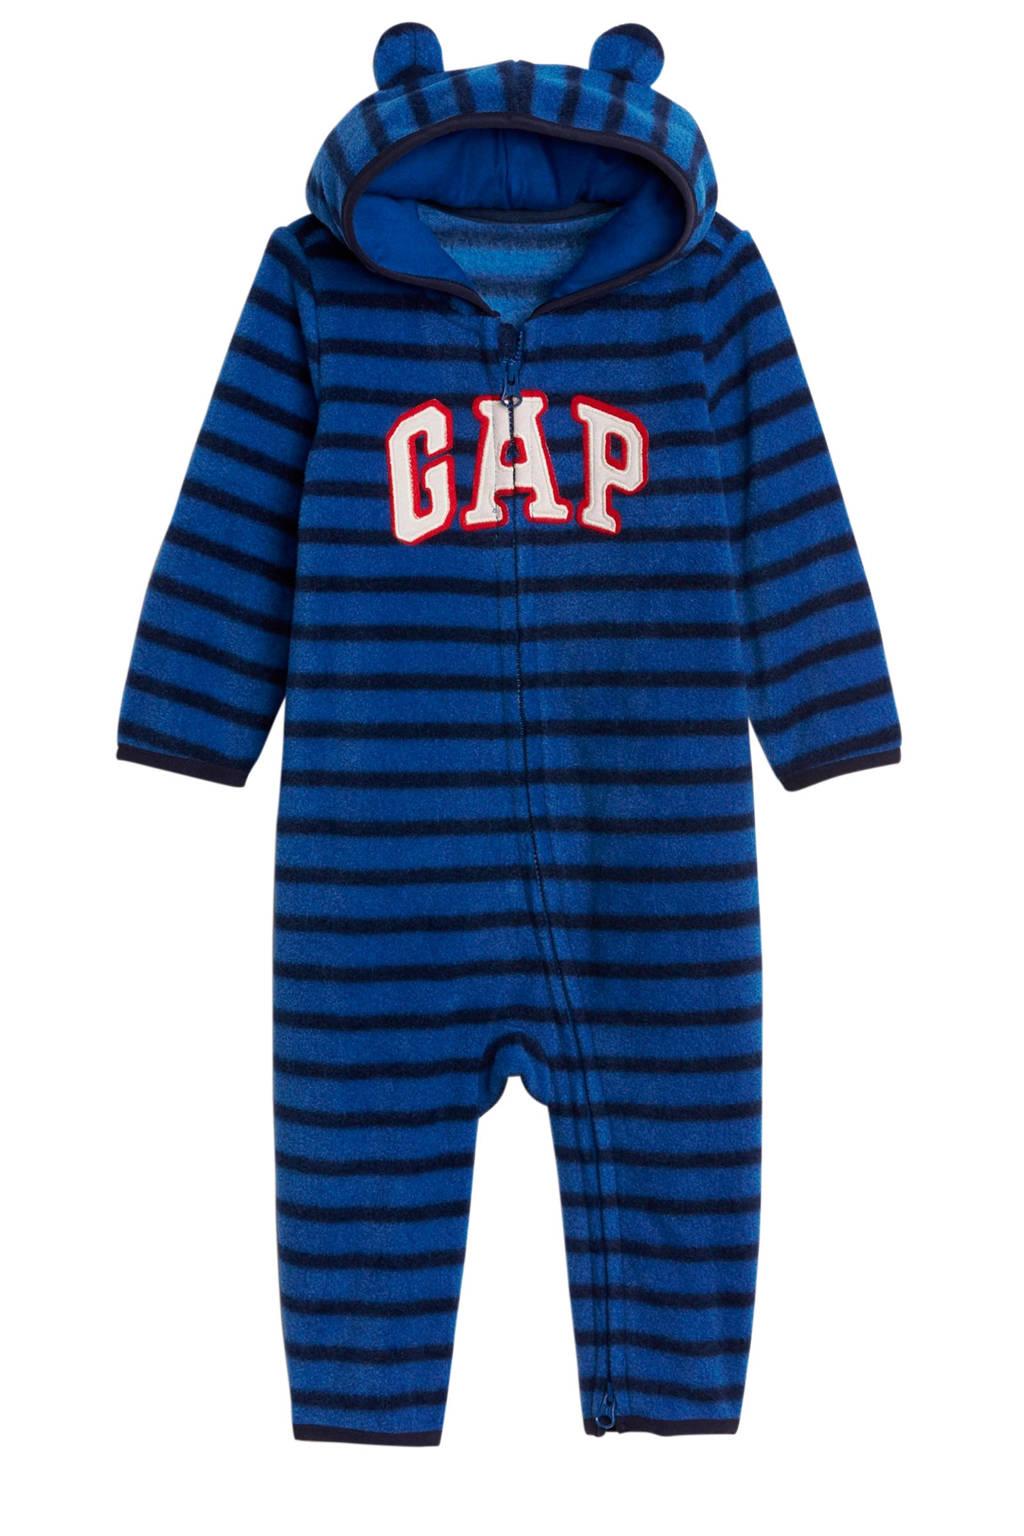 GAP baby gestreept fleece boxpak blauw, Blauw